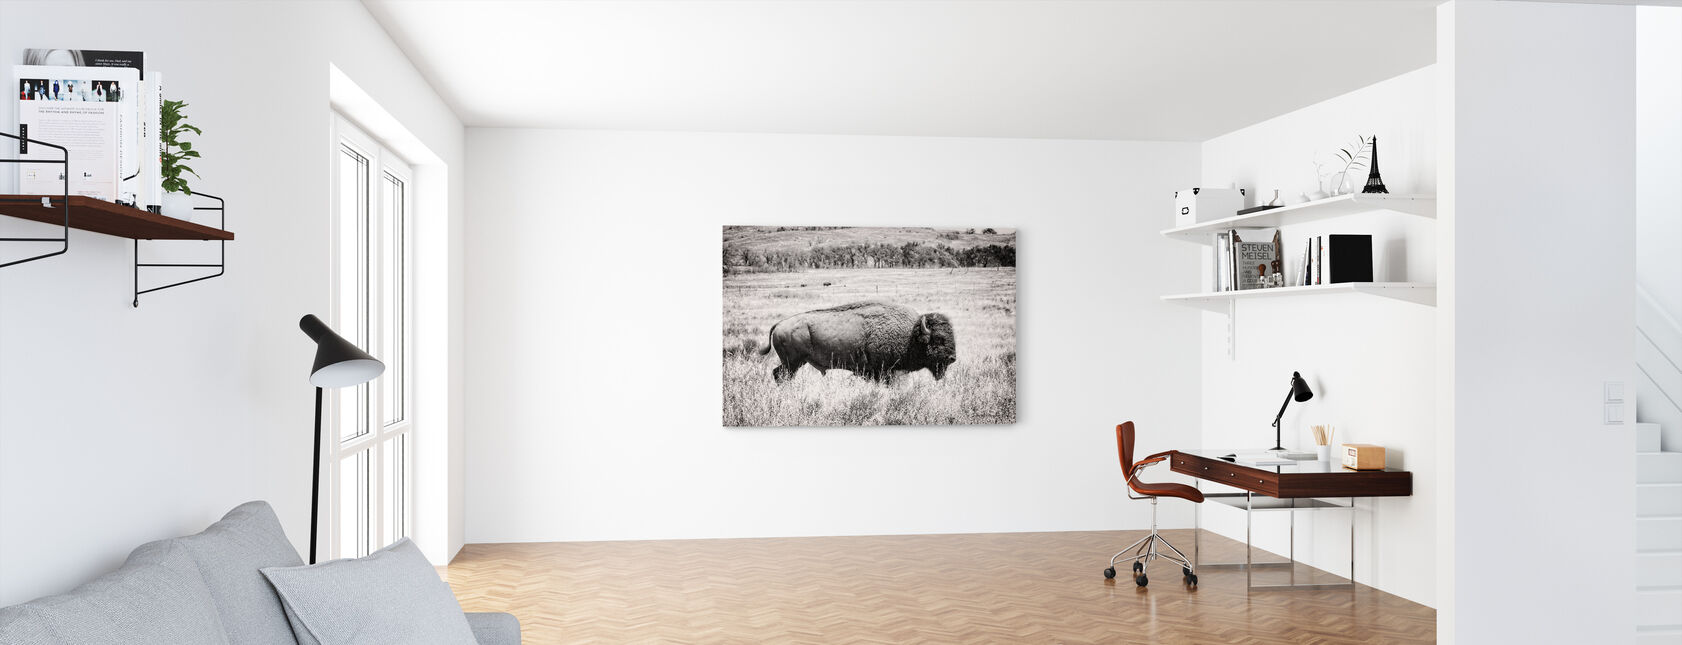 Buffalo - Canvas print - Office